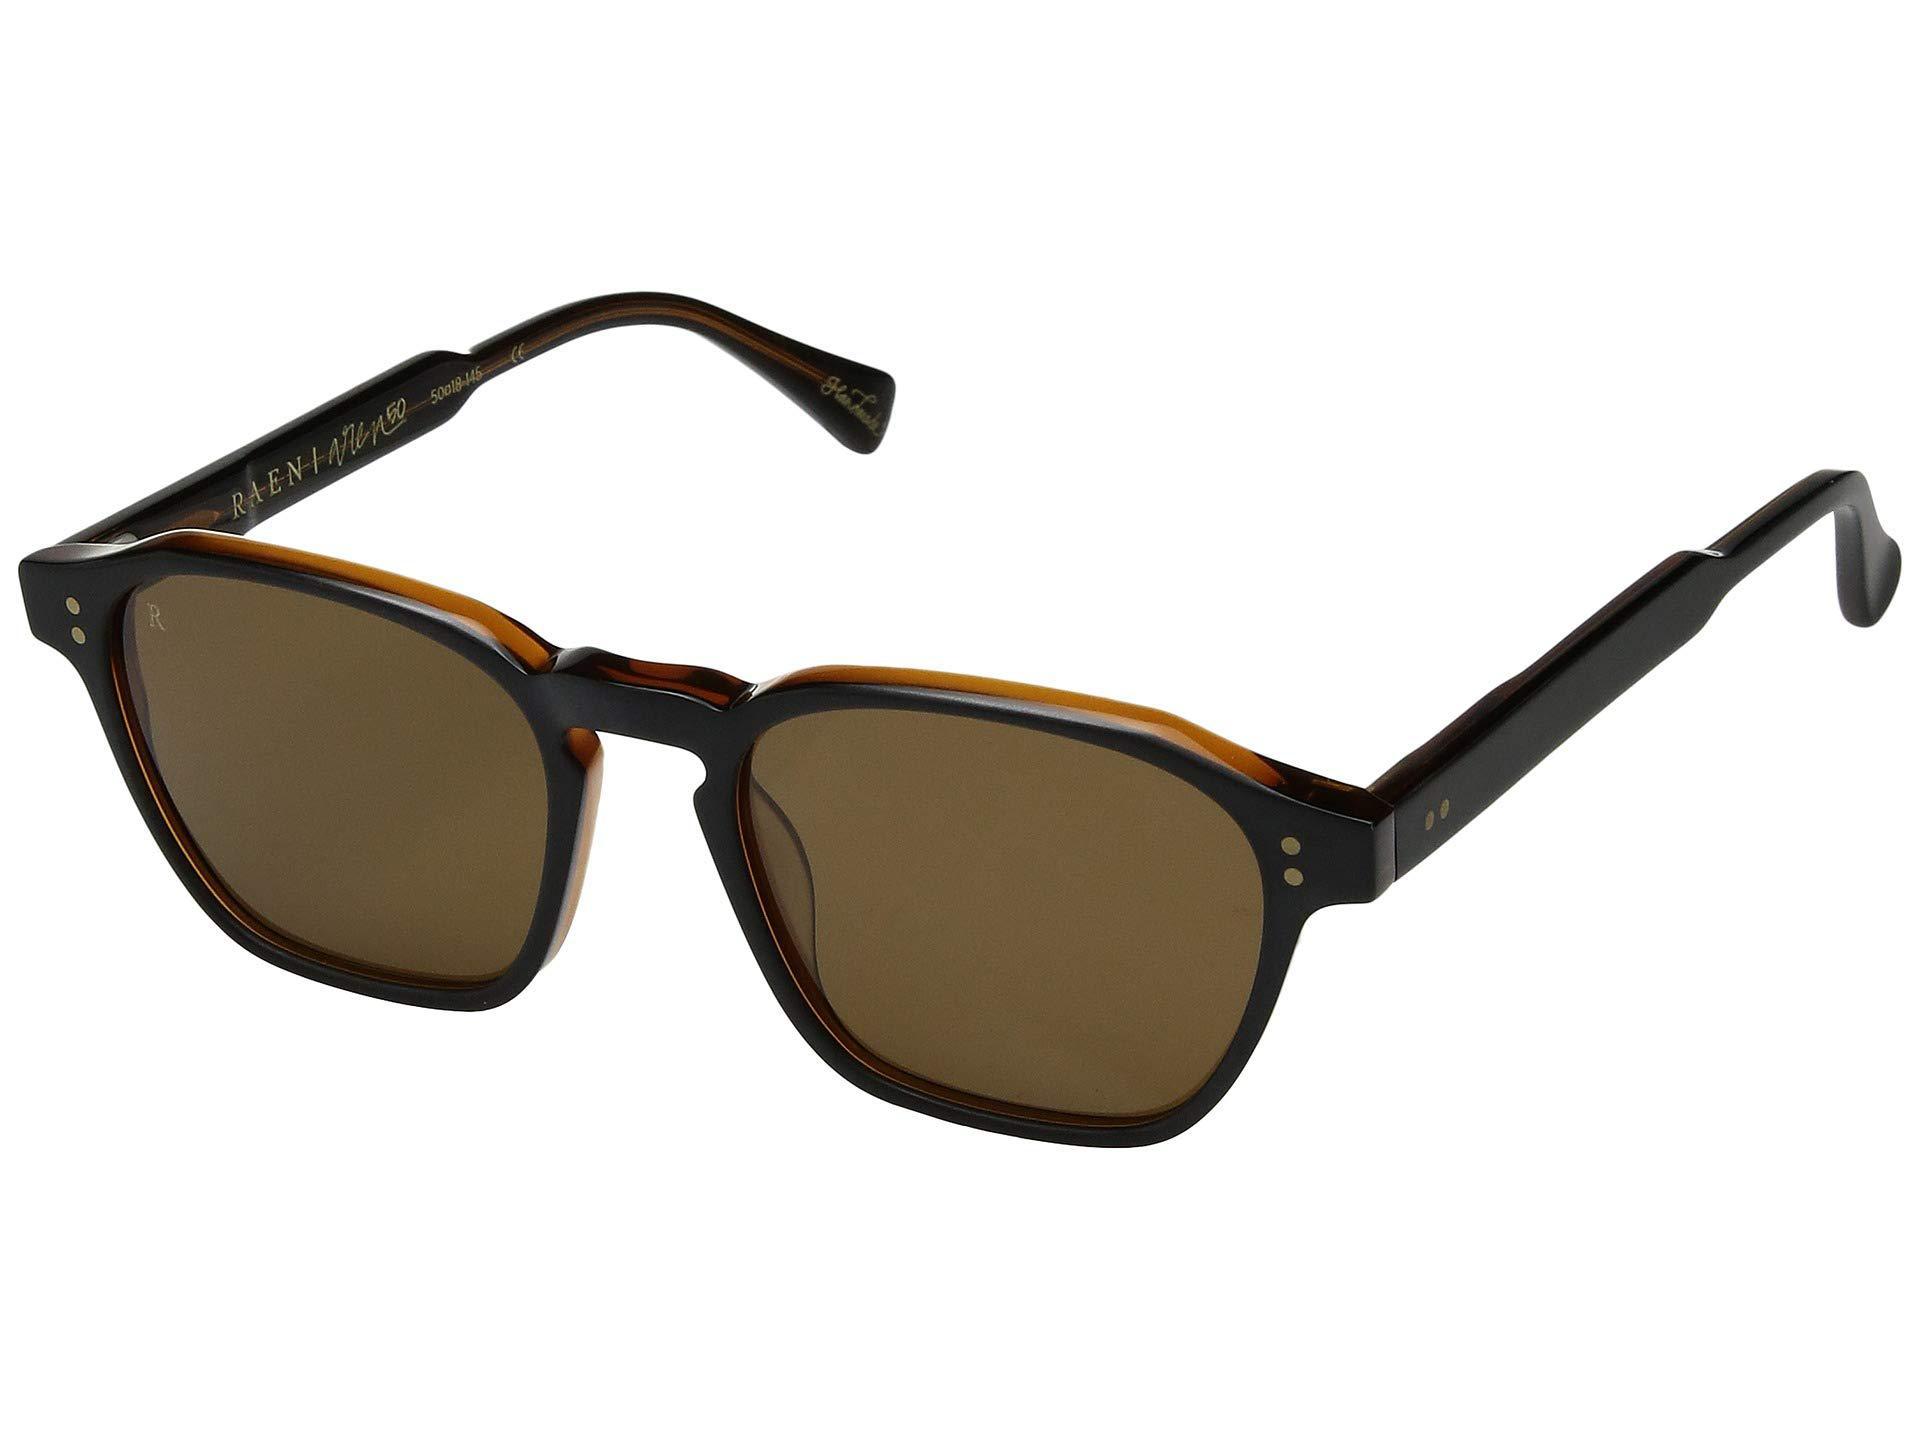 c1b2468489a Lyst - Raen Aren 50 (black   Tan brown) Sport Sunglasses in Brown